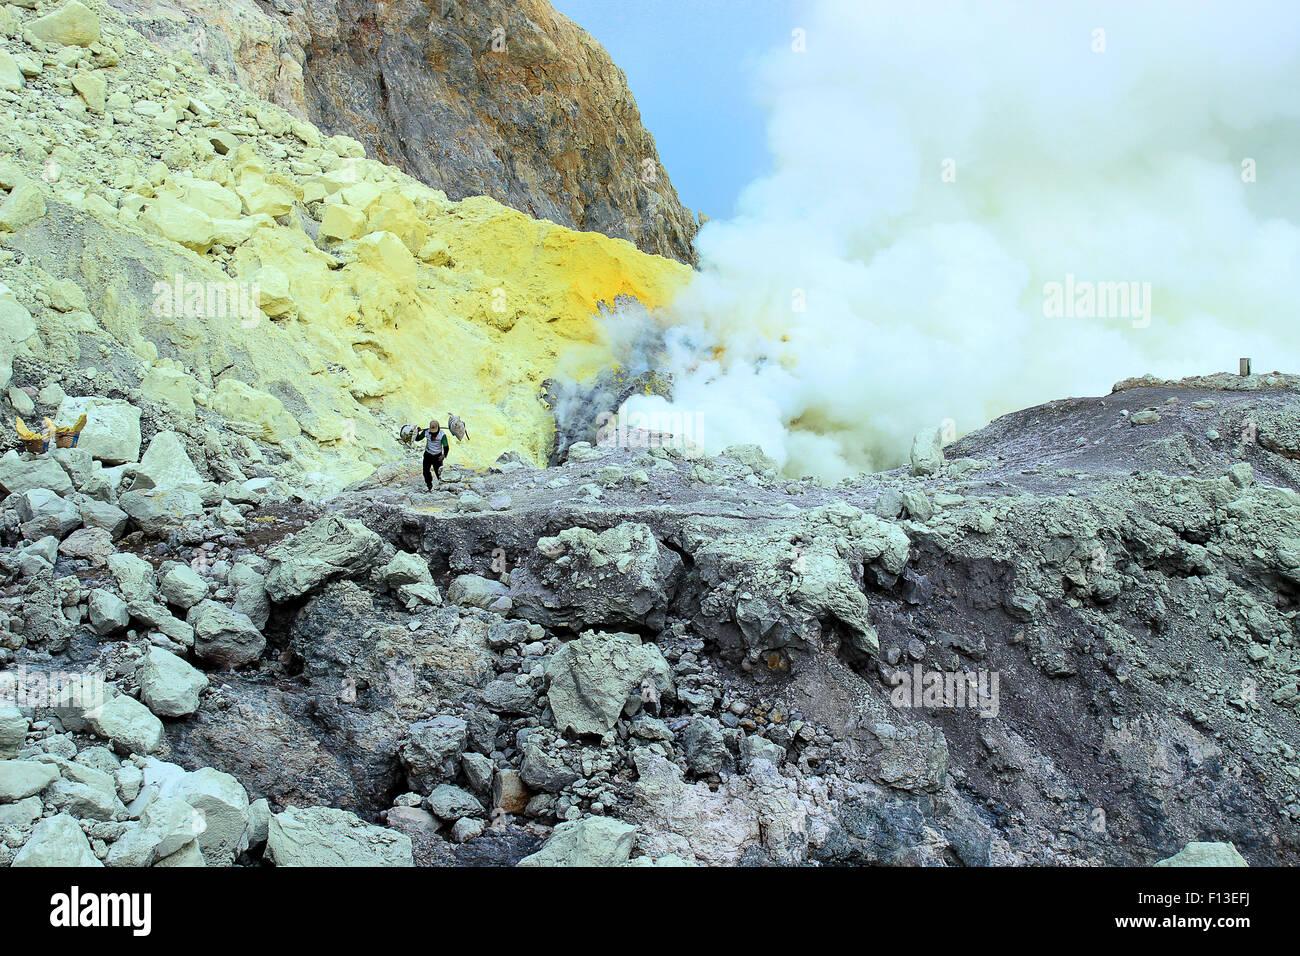 Sulphur Farmer carrying sacks, Ijen Crater, East Java,  Indonesia - Stock Image